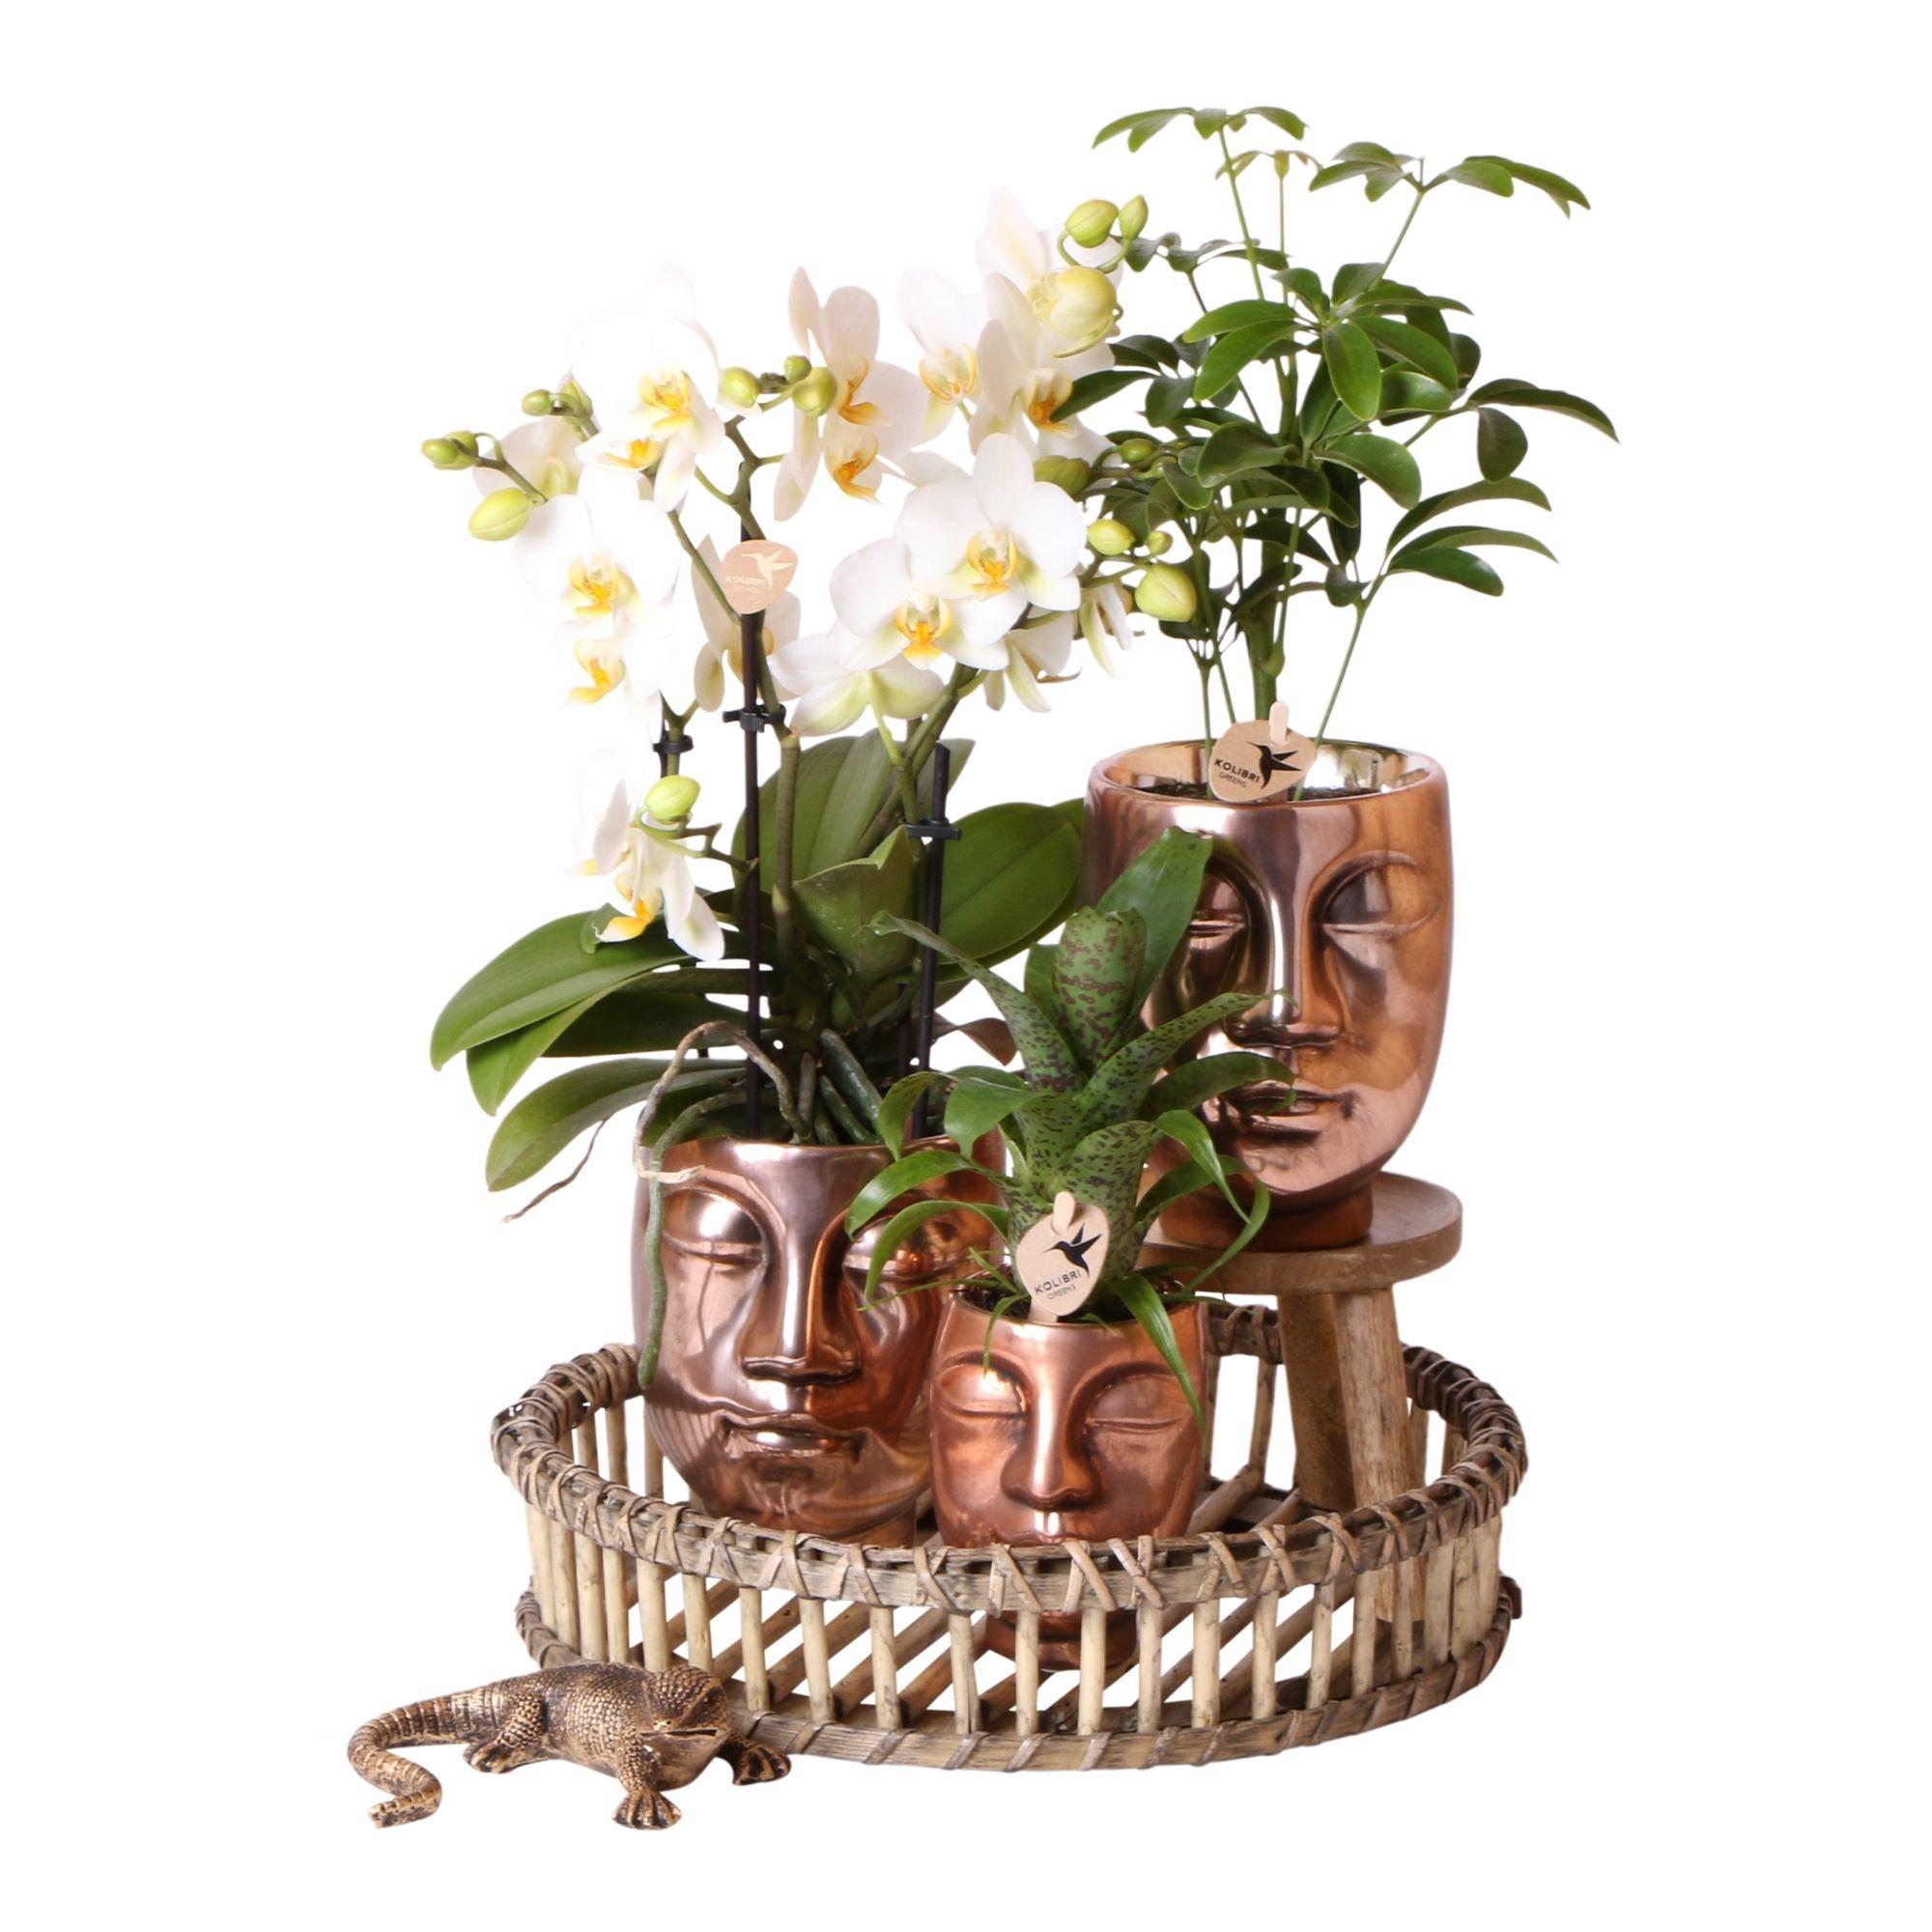 Kolibri Company - Complete planten set Gift set face-2-face bronze